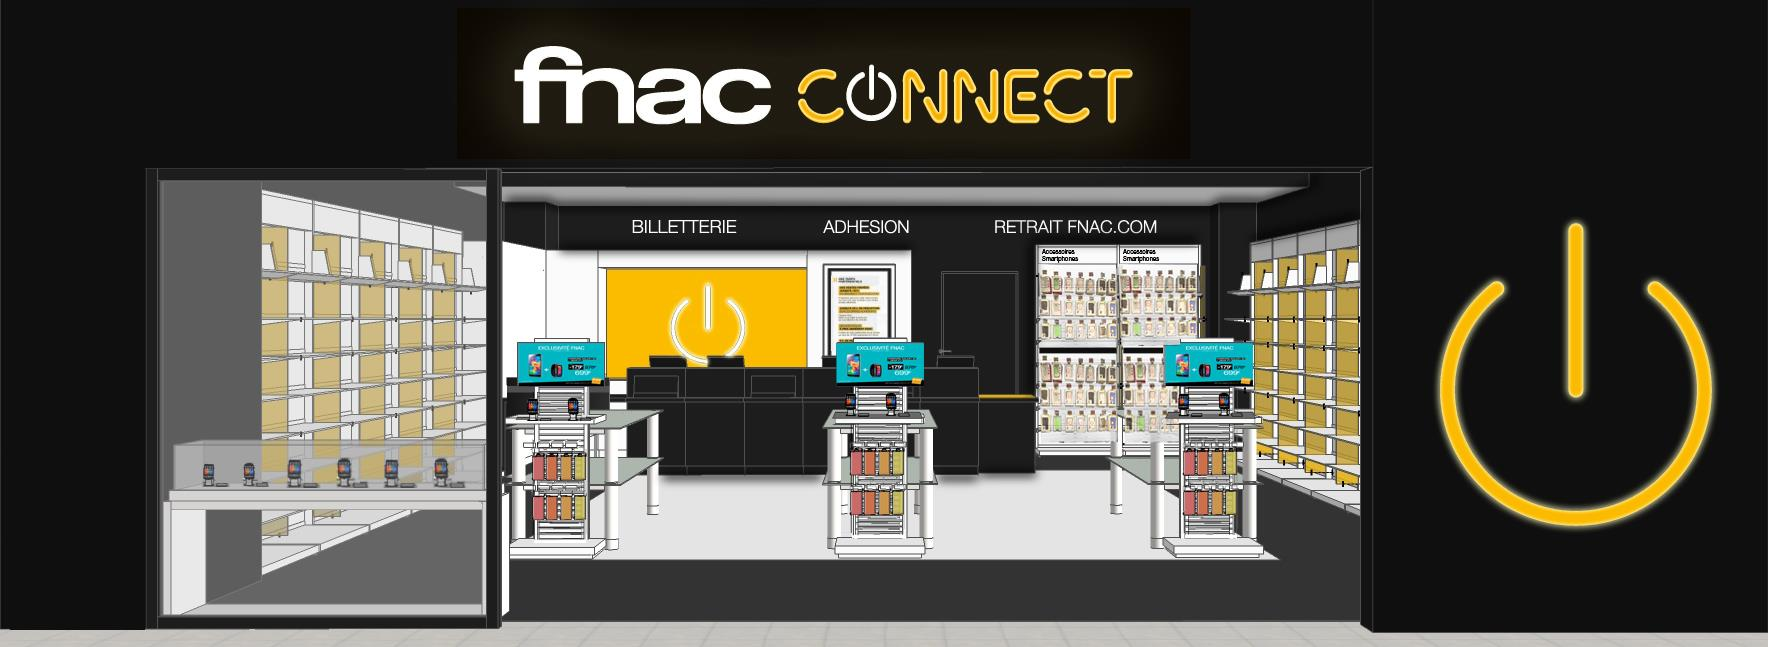 fnac connect ouvre angoul me un magasin 100 smartphones high tech et objets connect s. Black Bedroom Furniture Sets. Home Design Ideas